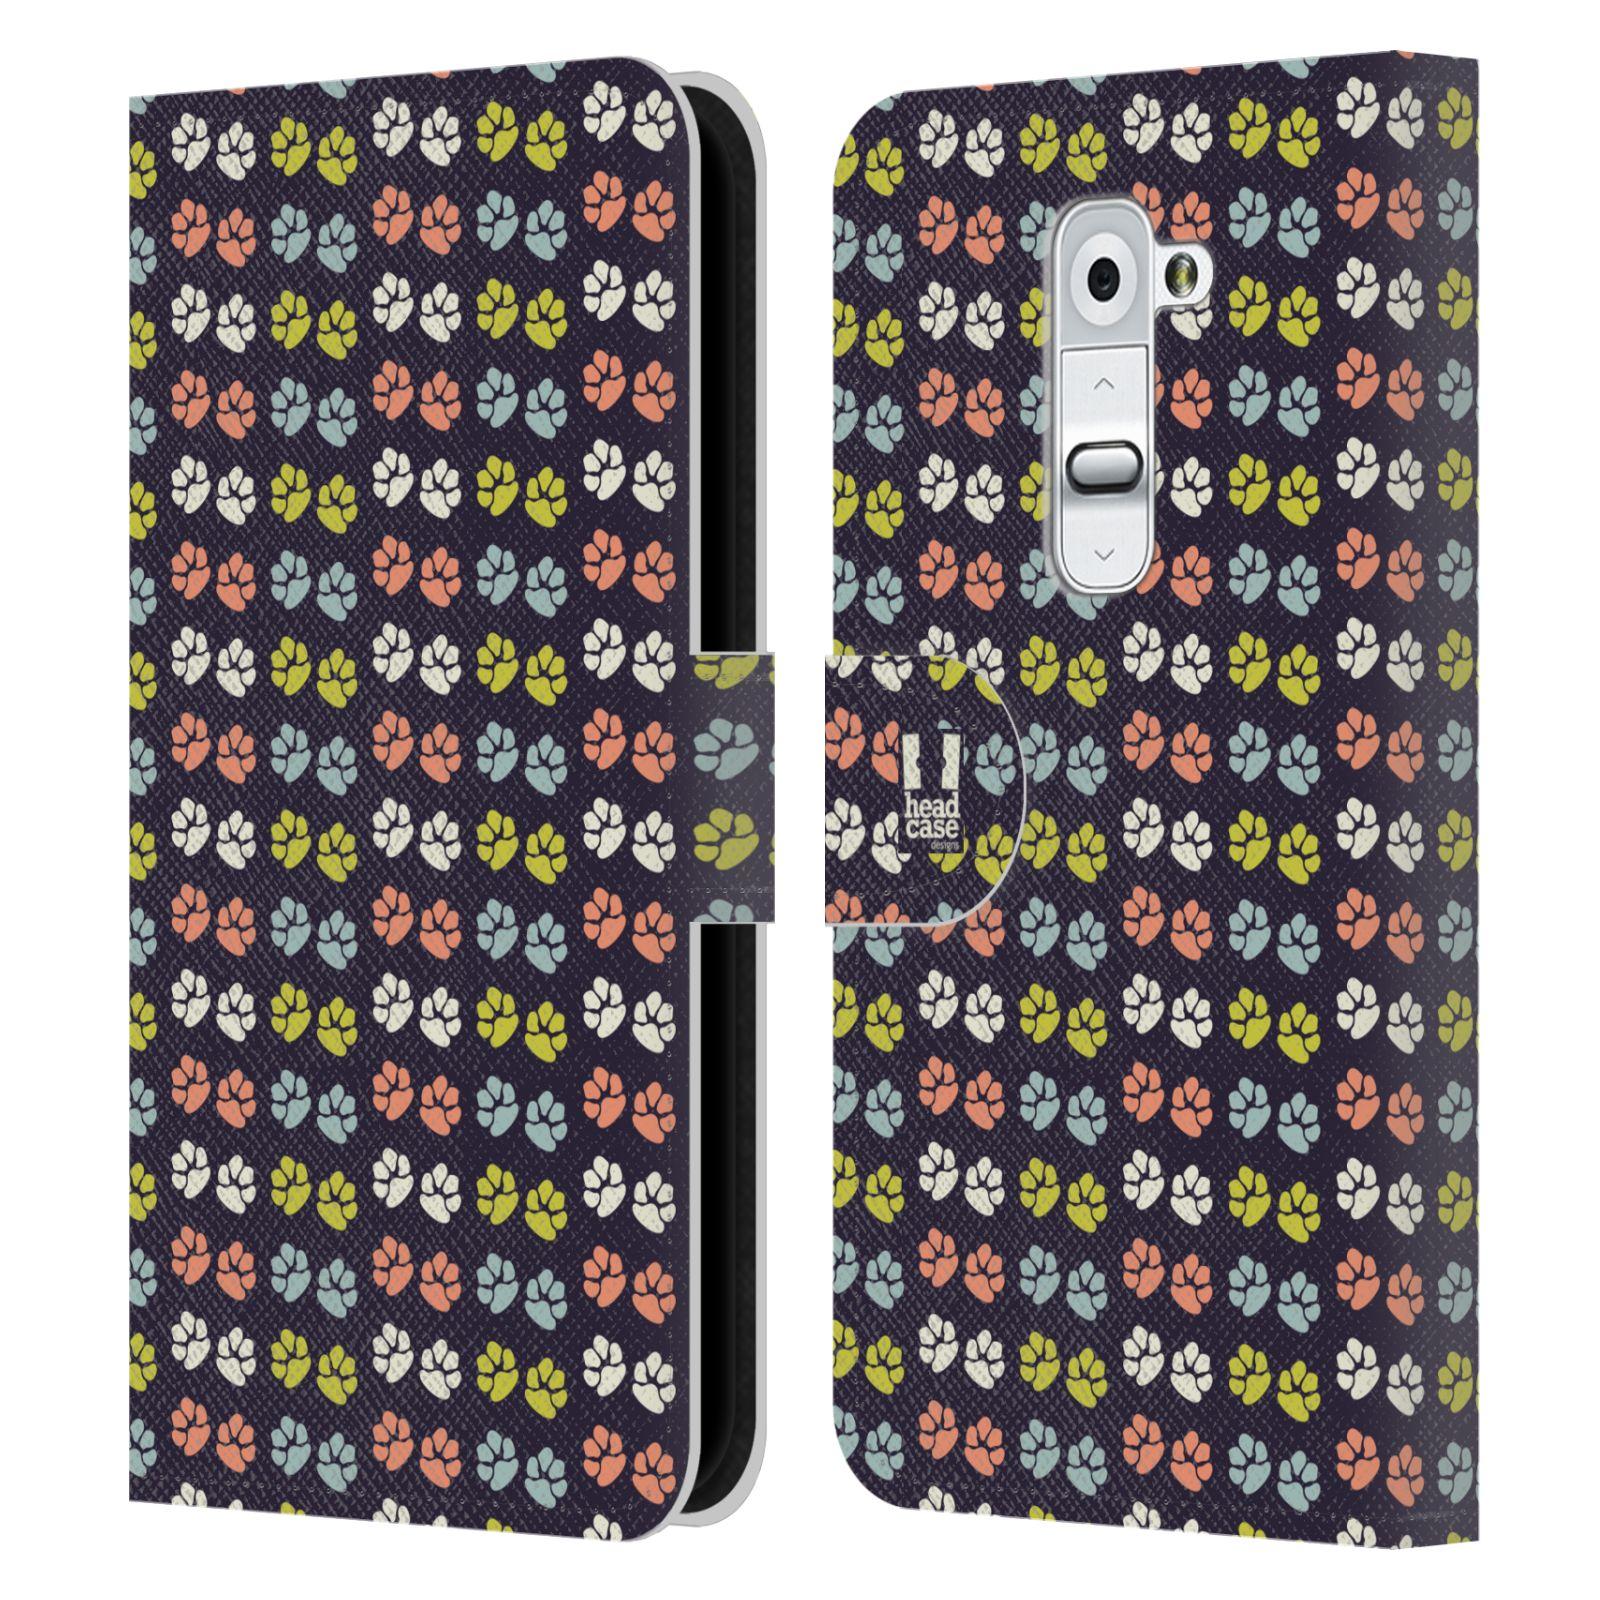 HEAD CASE Flipové pouzdro pro mobil LG G2 (D802) Pejsek ťapky barevné RETRO